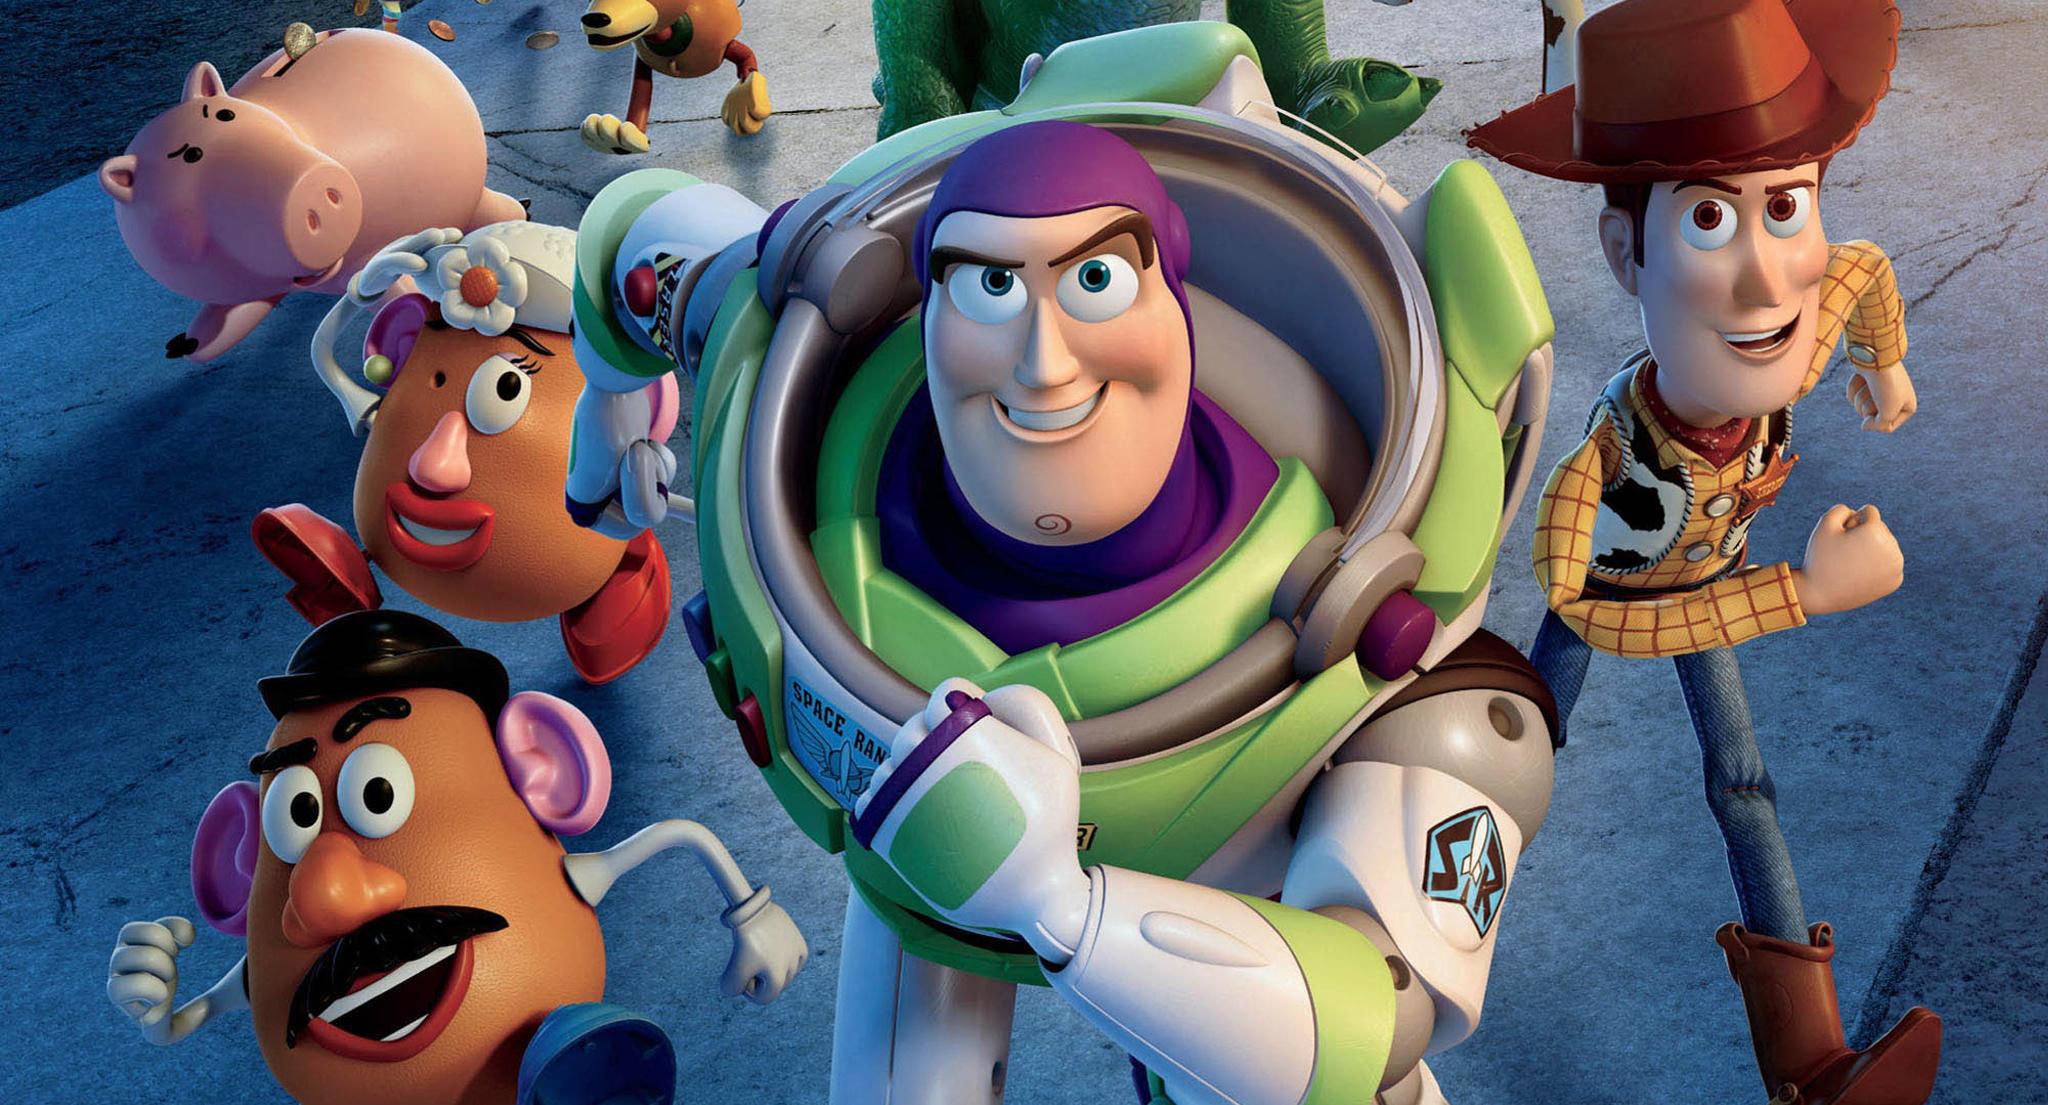 Jon Negroni's Pixar Theory Timeline